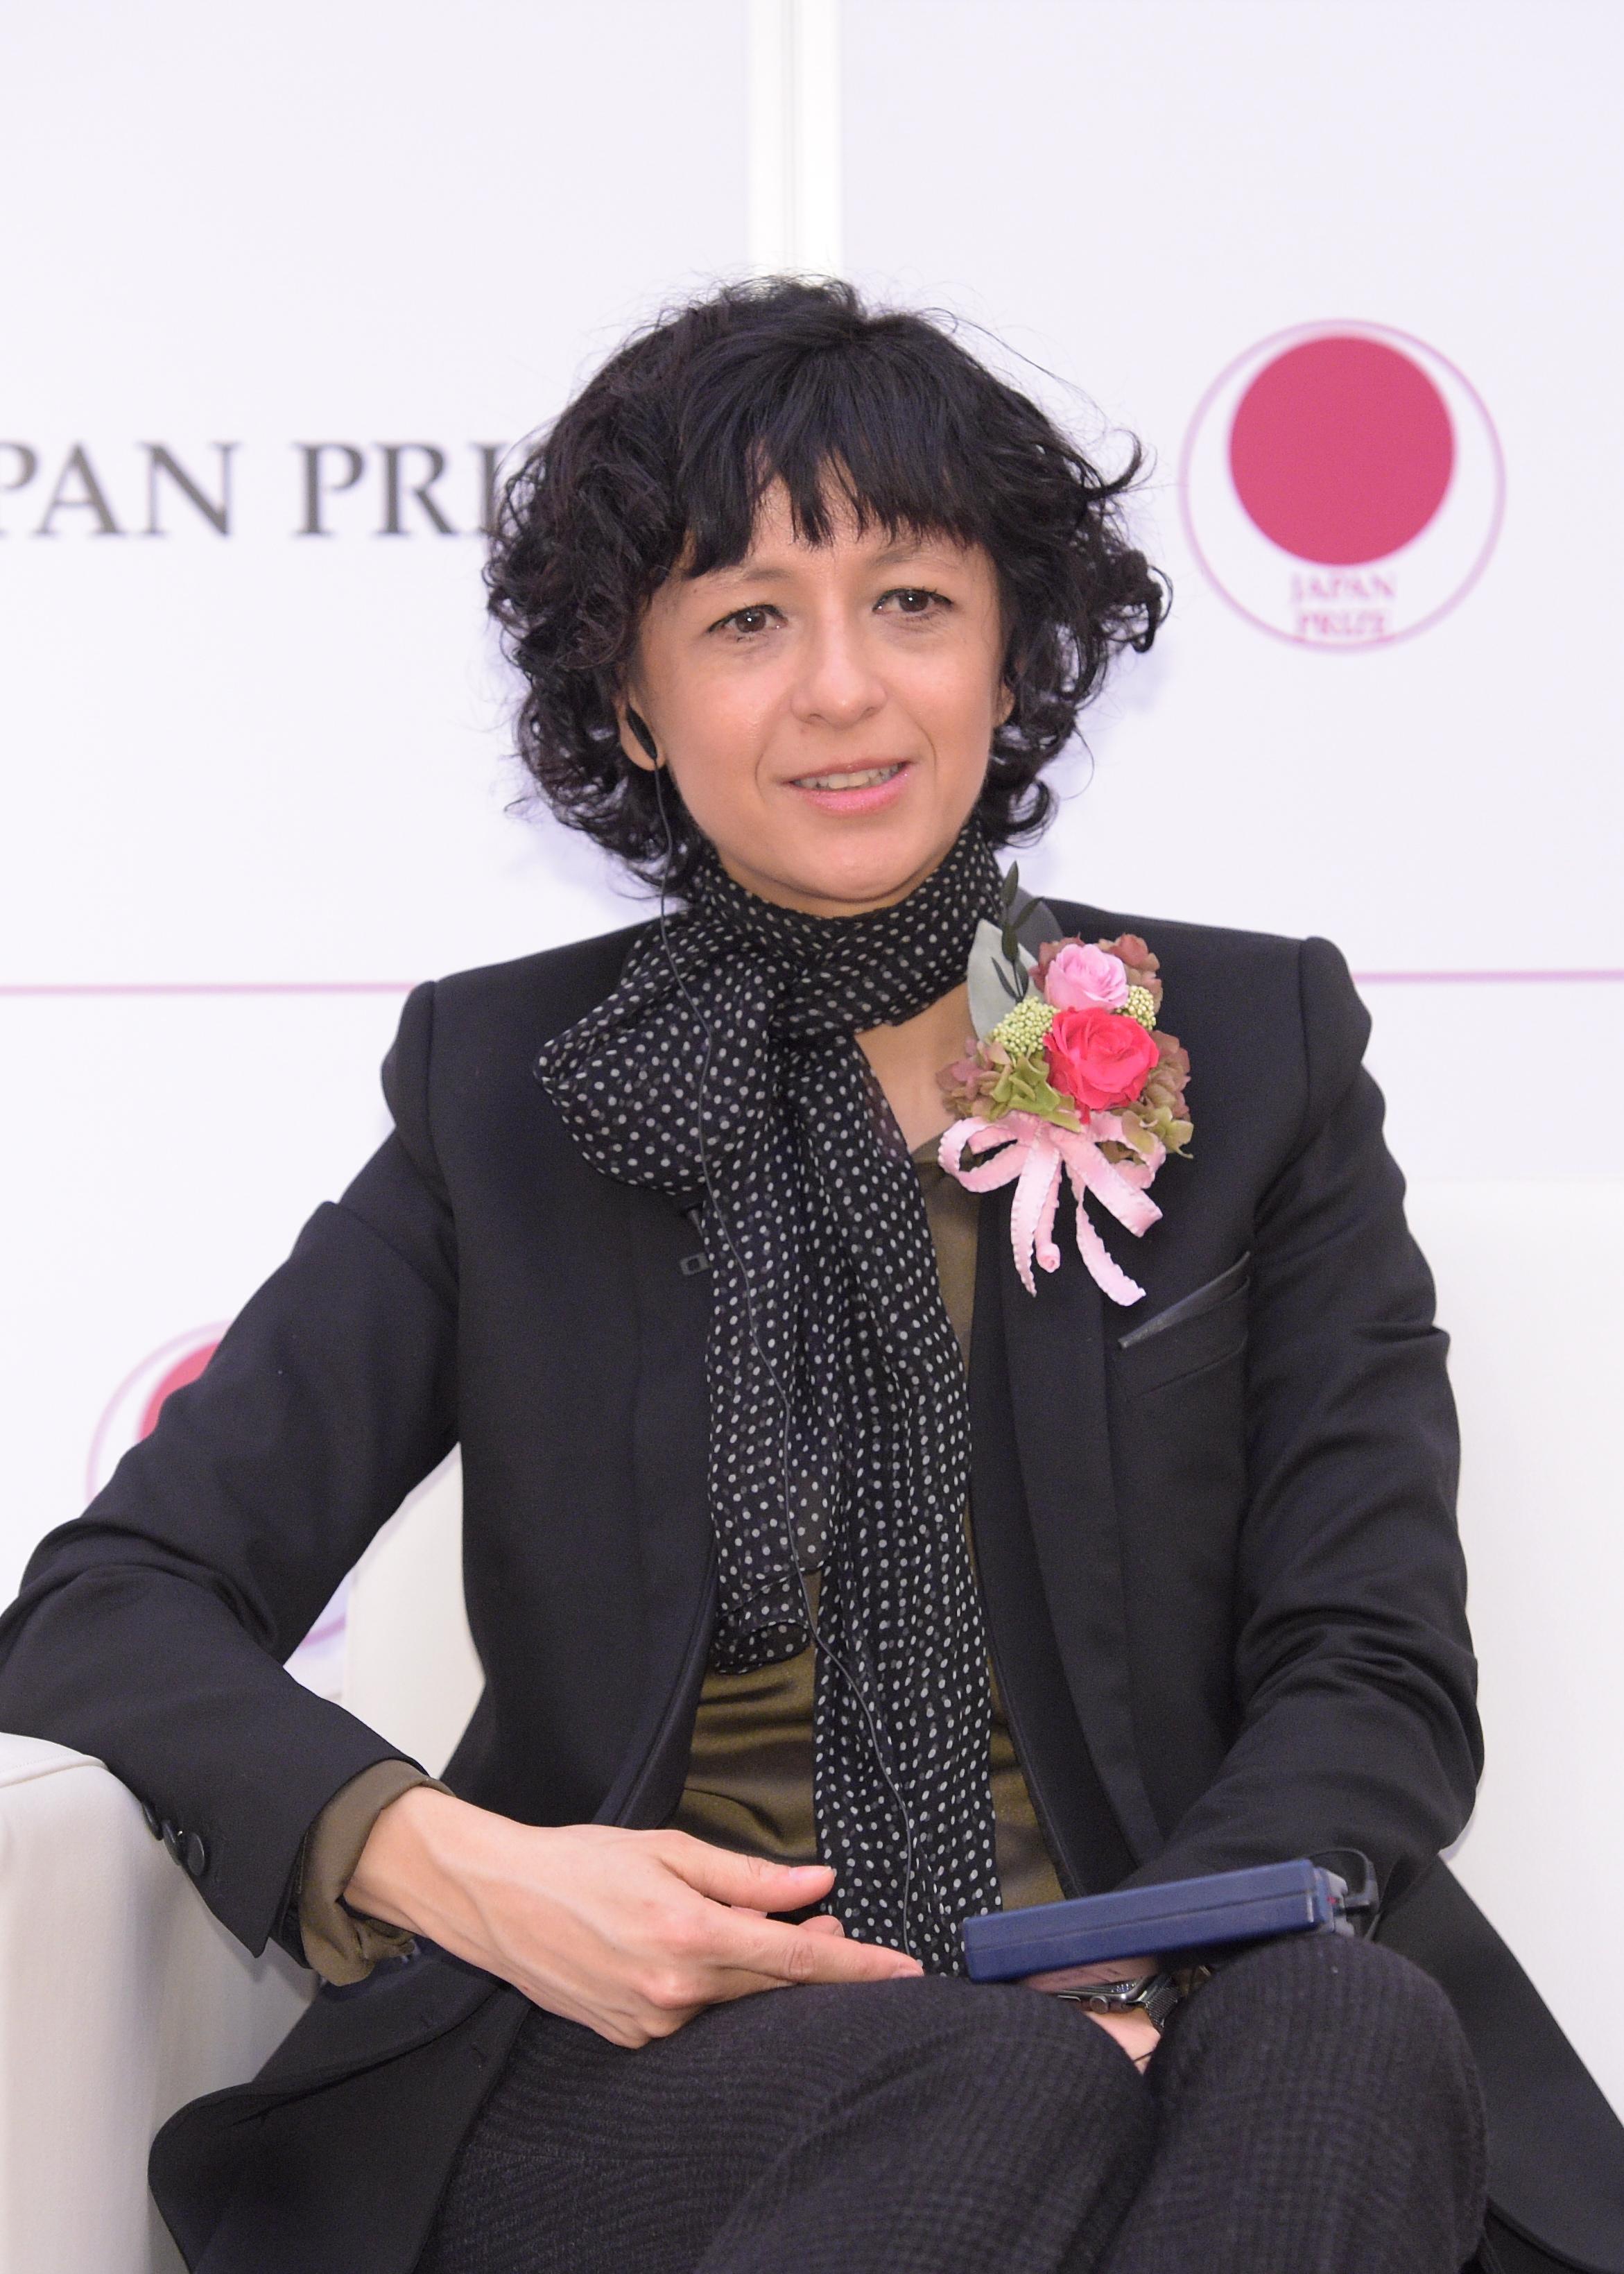 The Japan Prize Foundation